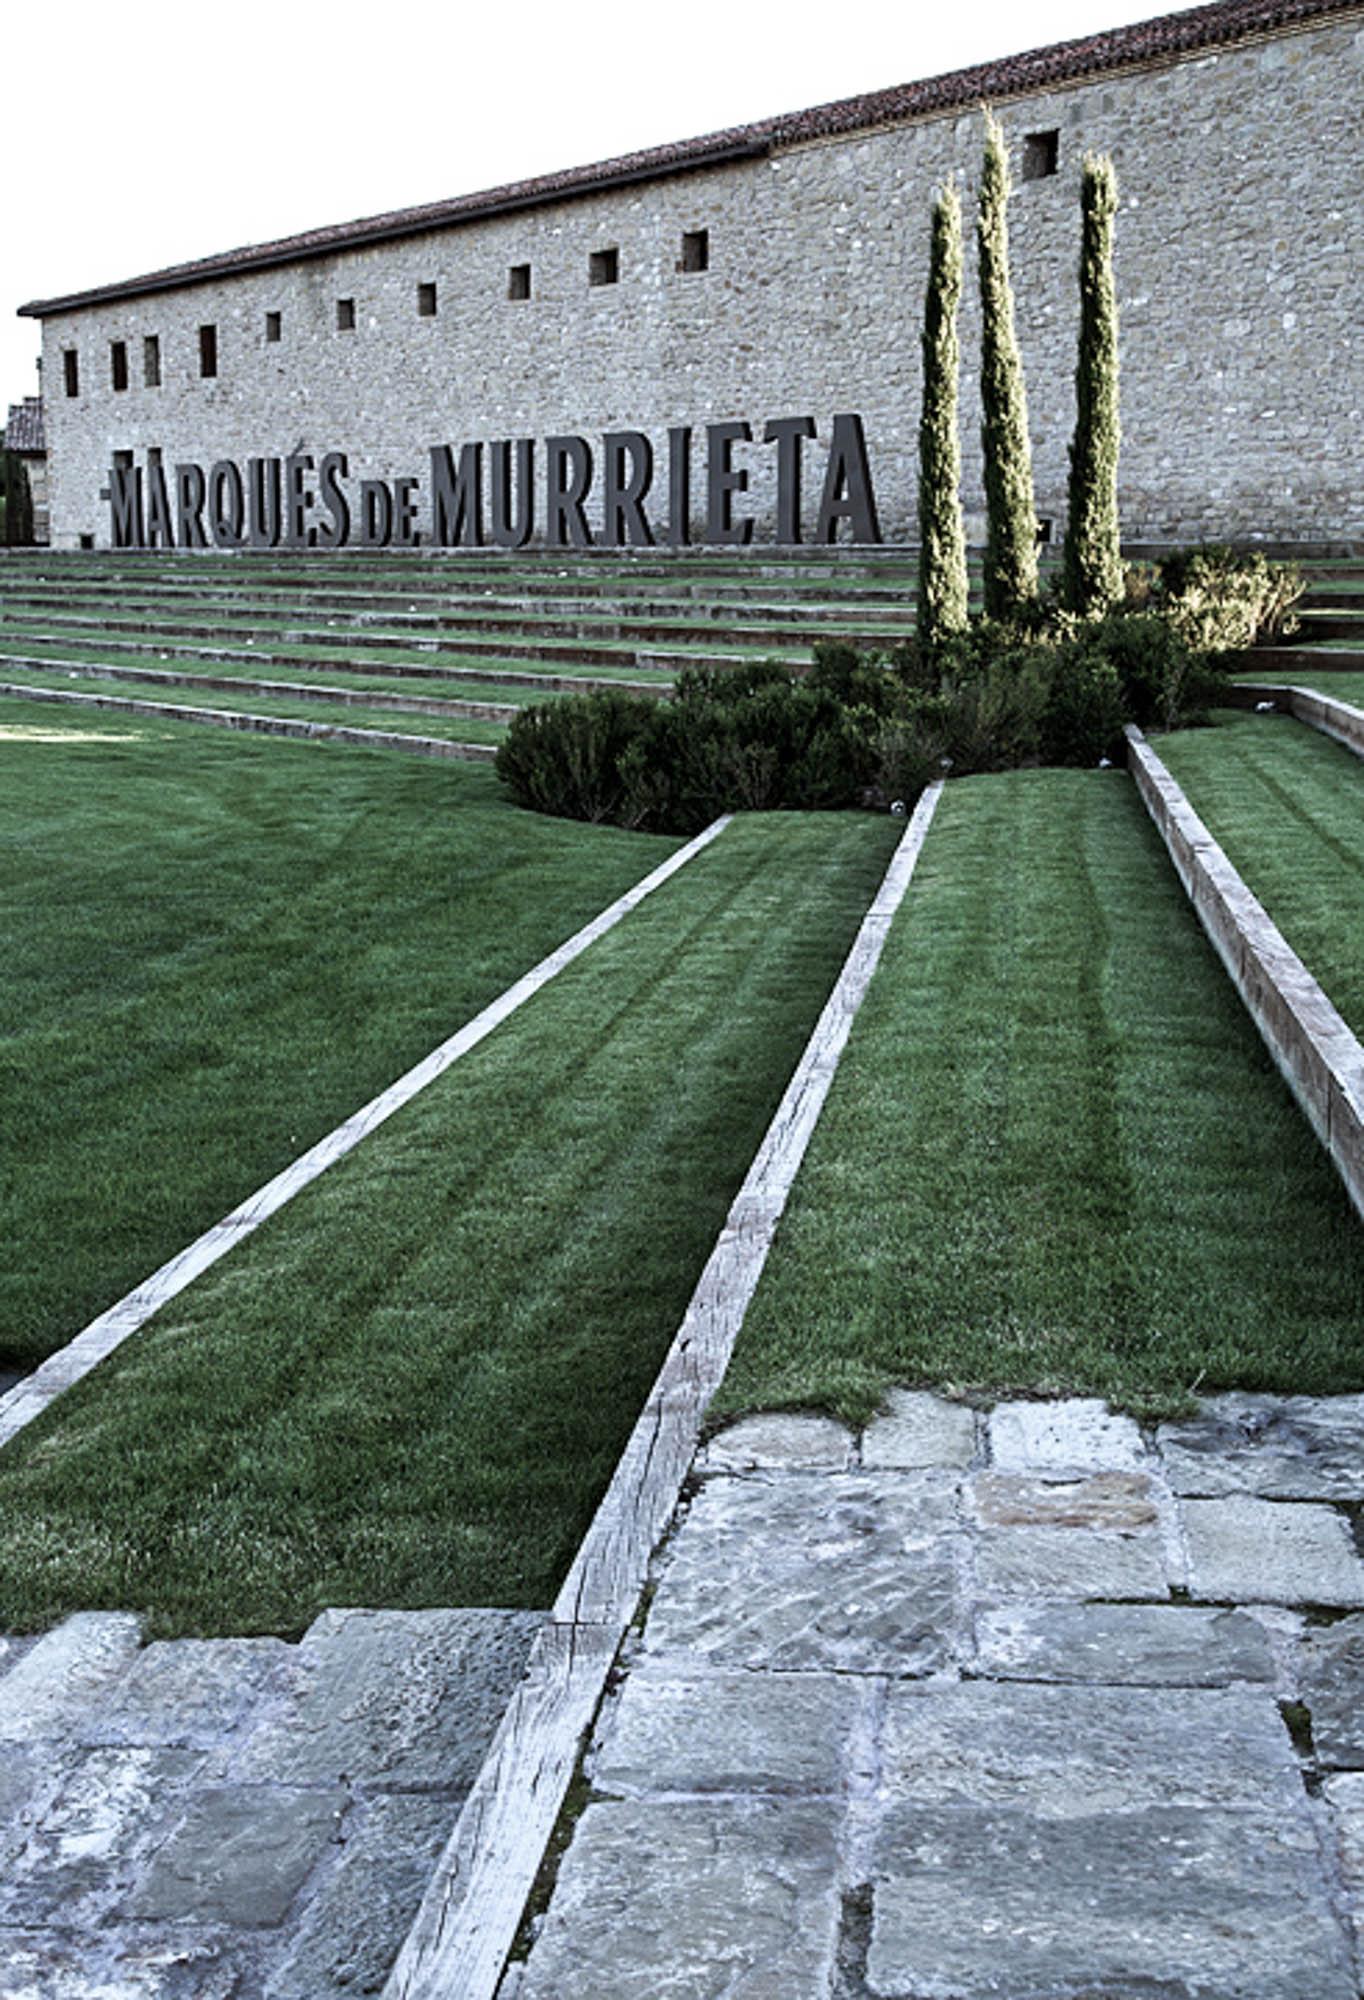 Murrieta-7.jpg